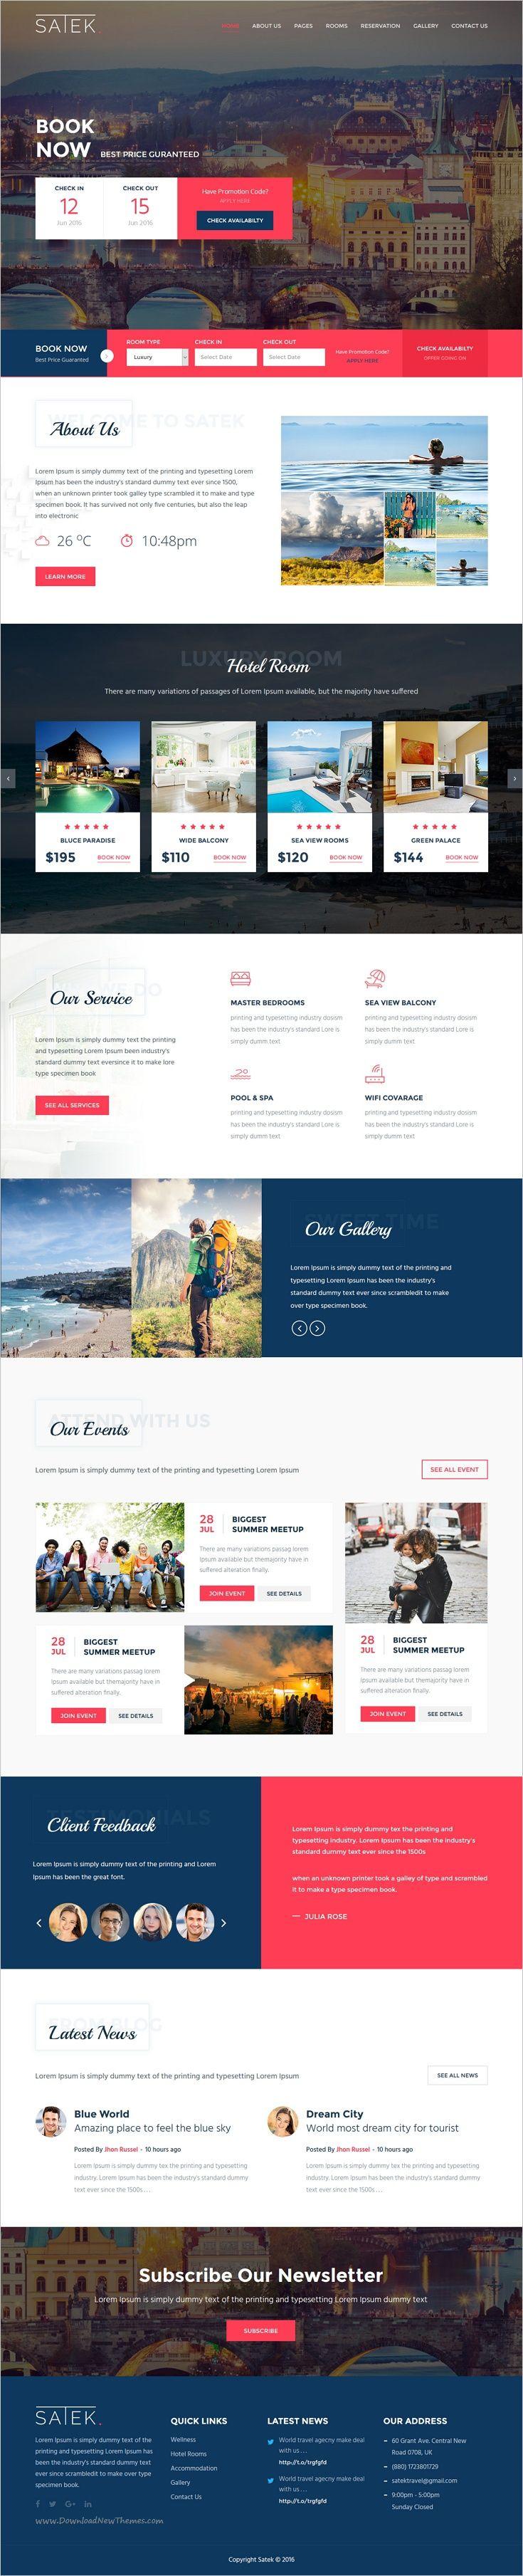 Download Free Job Search Listing Website Template Psd At Downloadpsd Com Web Design Jobs Fun Website Design List Website